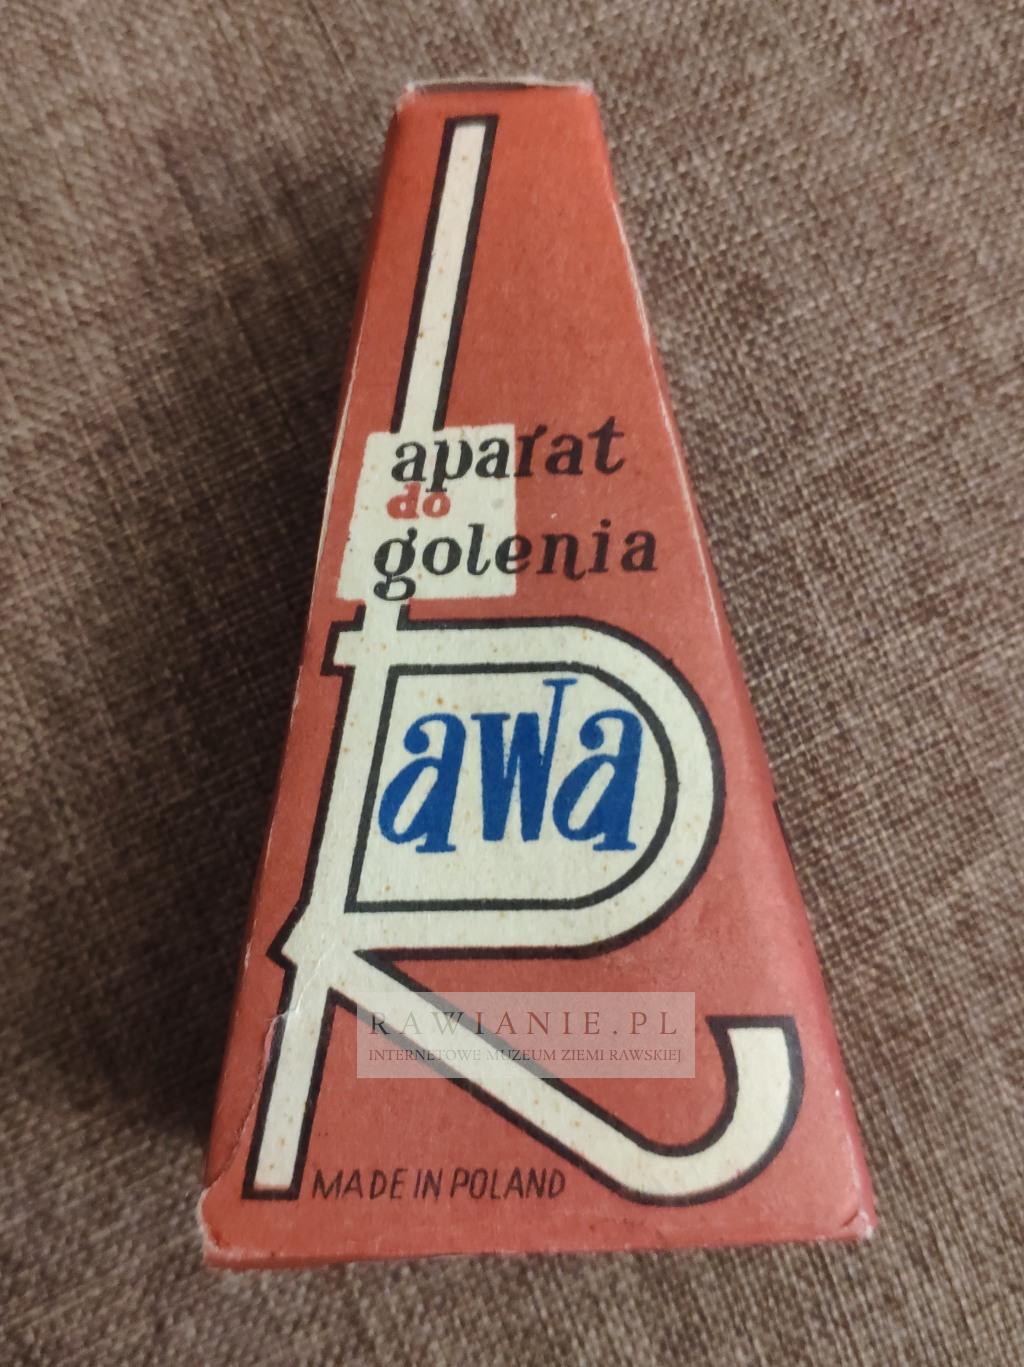 Aparat go golenia - Made in Rawa